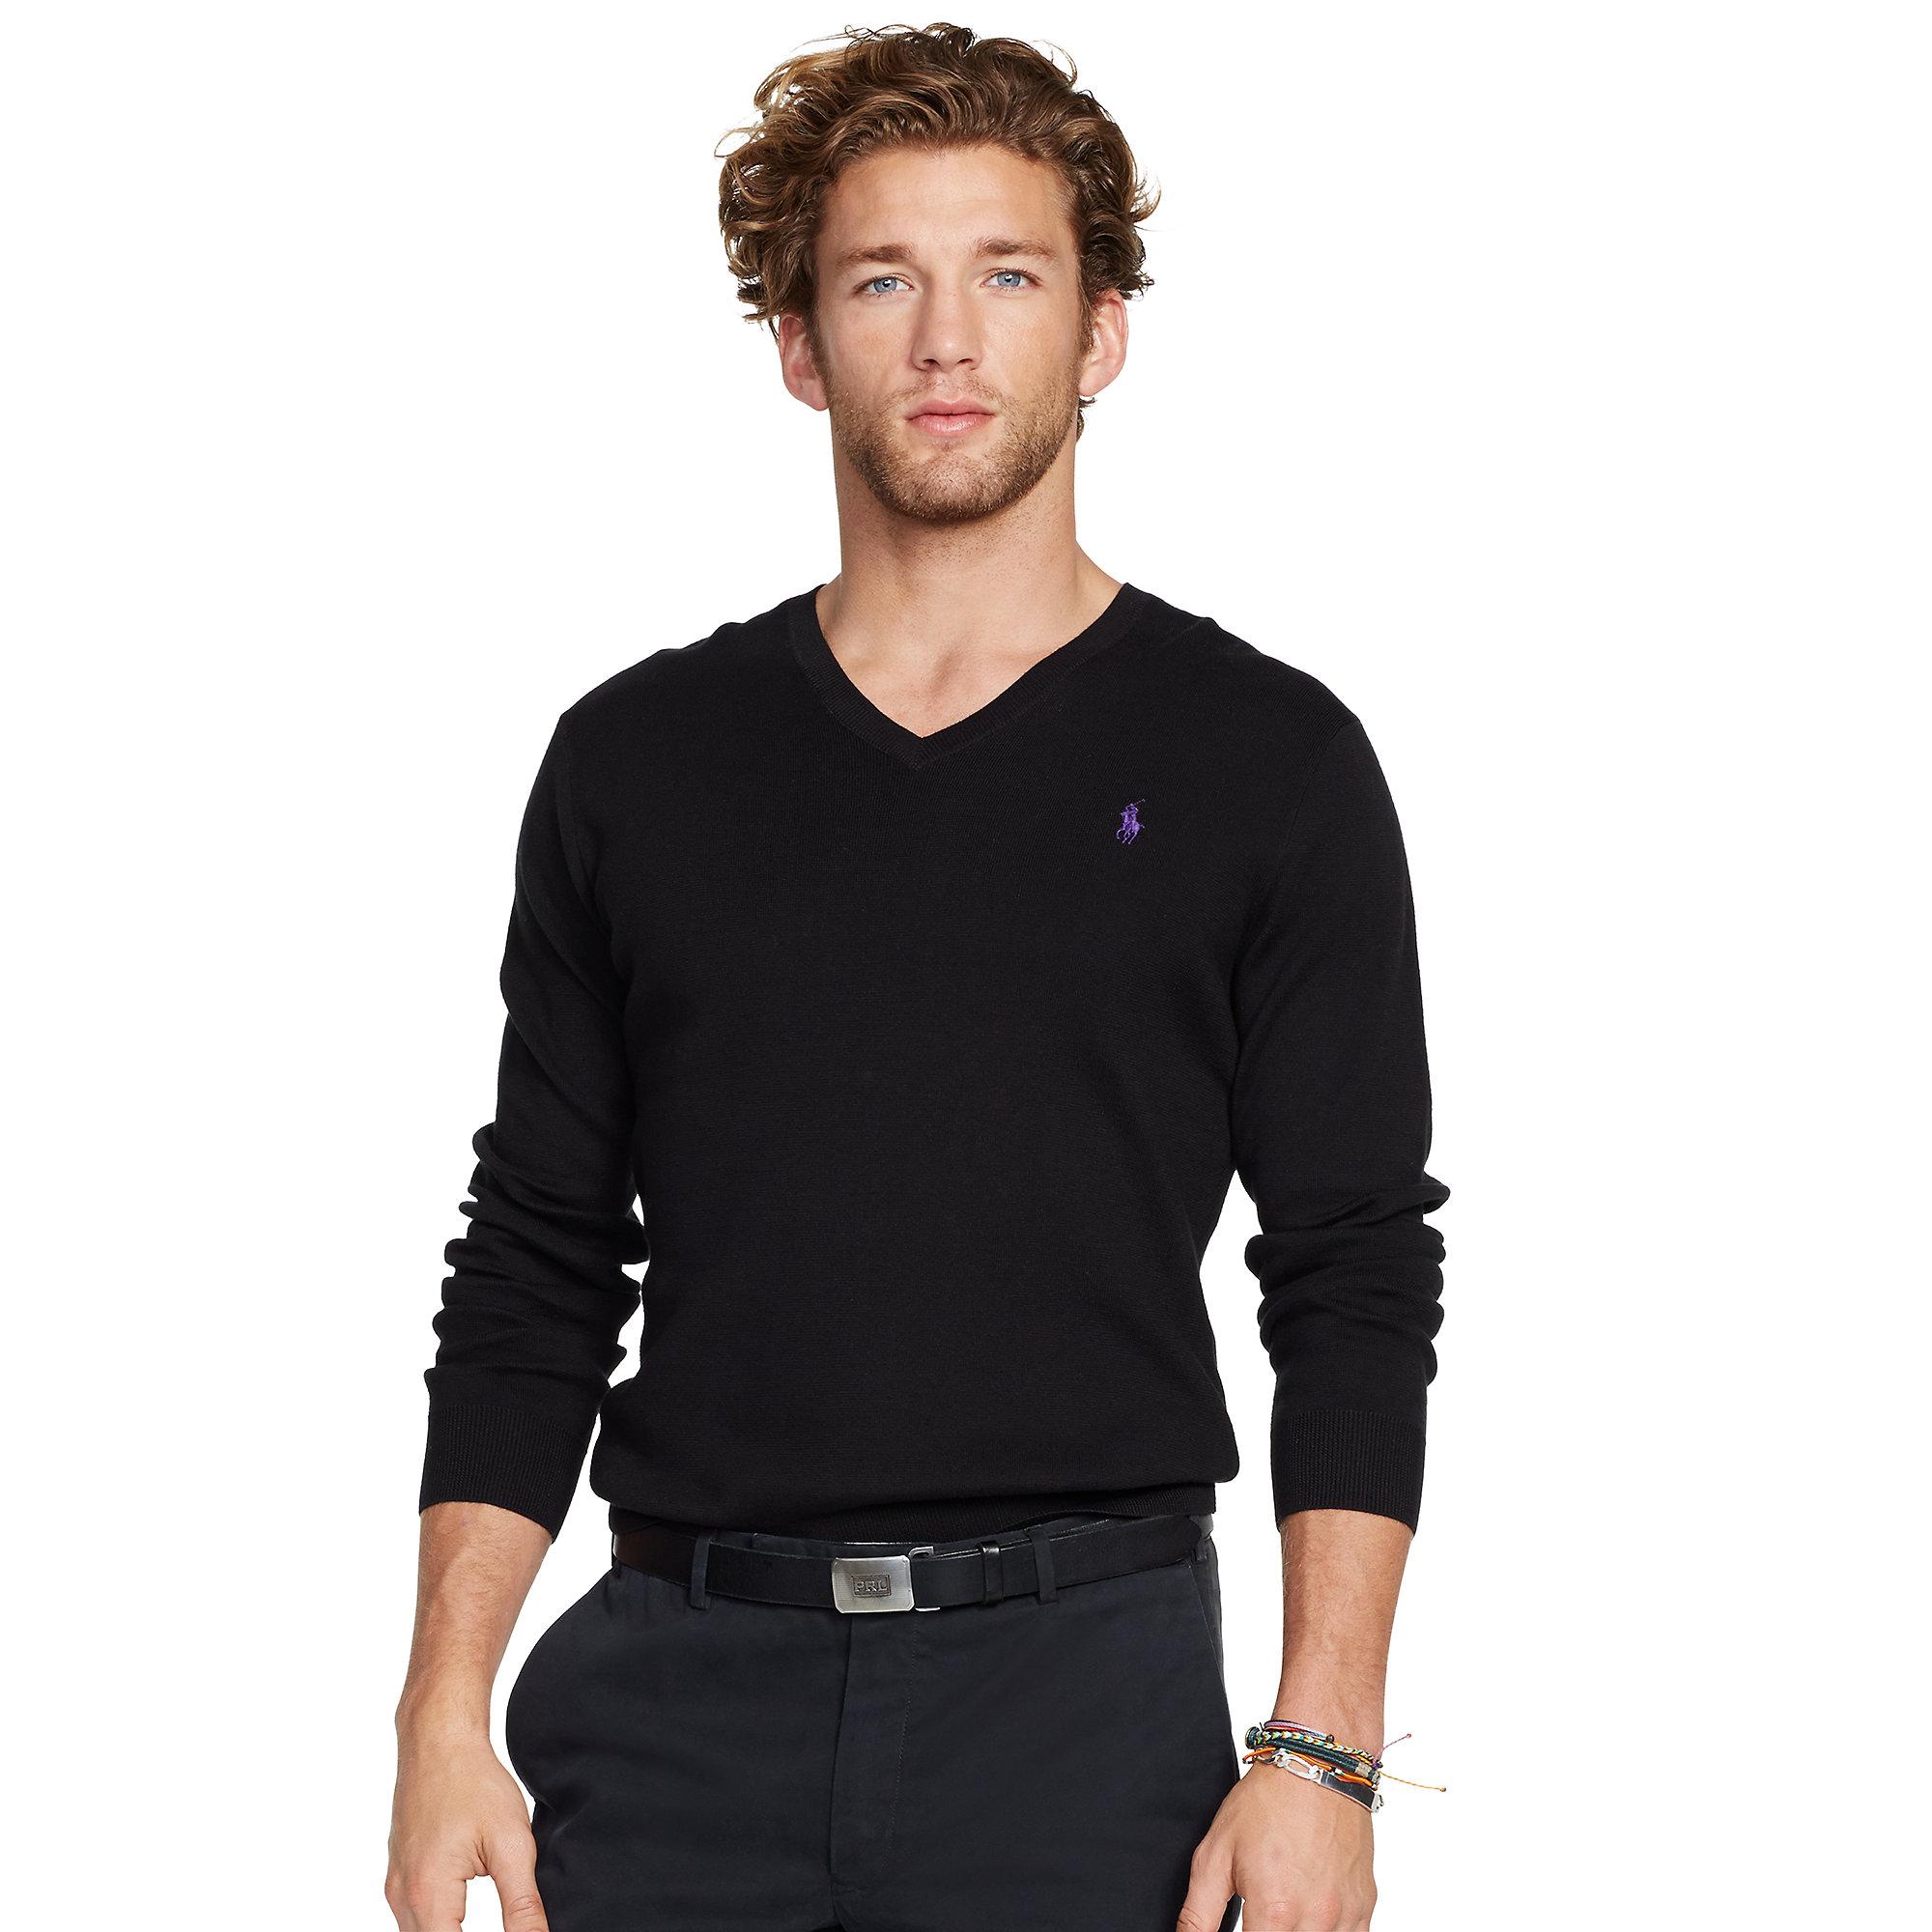 8c8c9855c182 Lyst - Polo Ralph Lauren Slim-fit V-neck Sweater in Black for Men